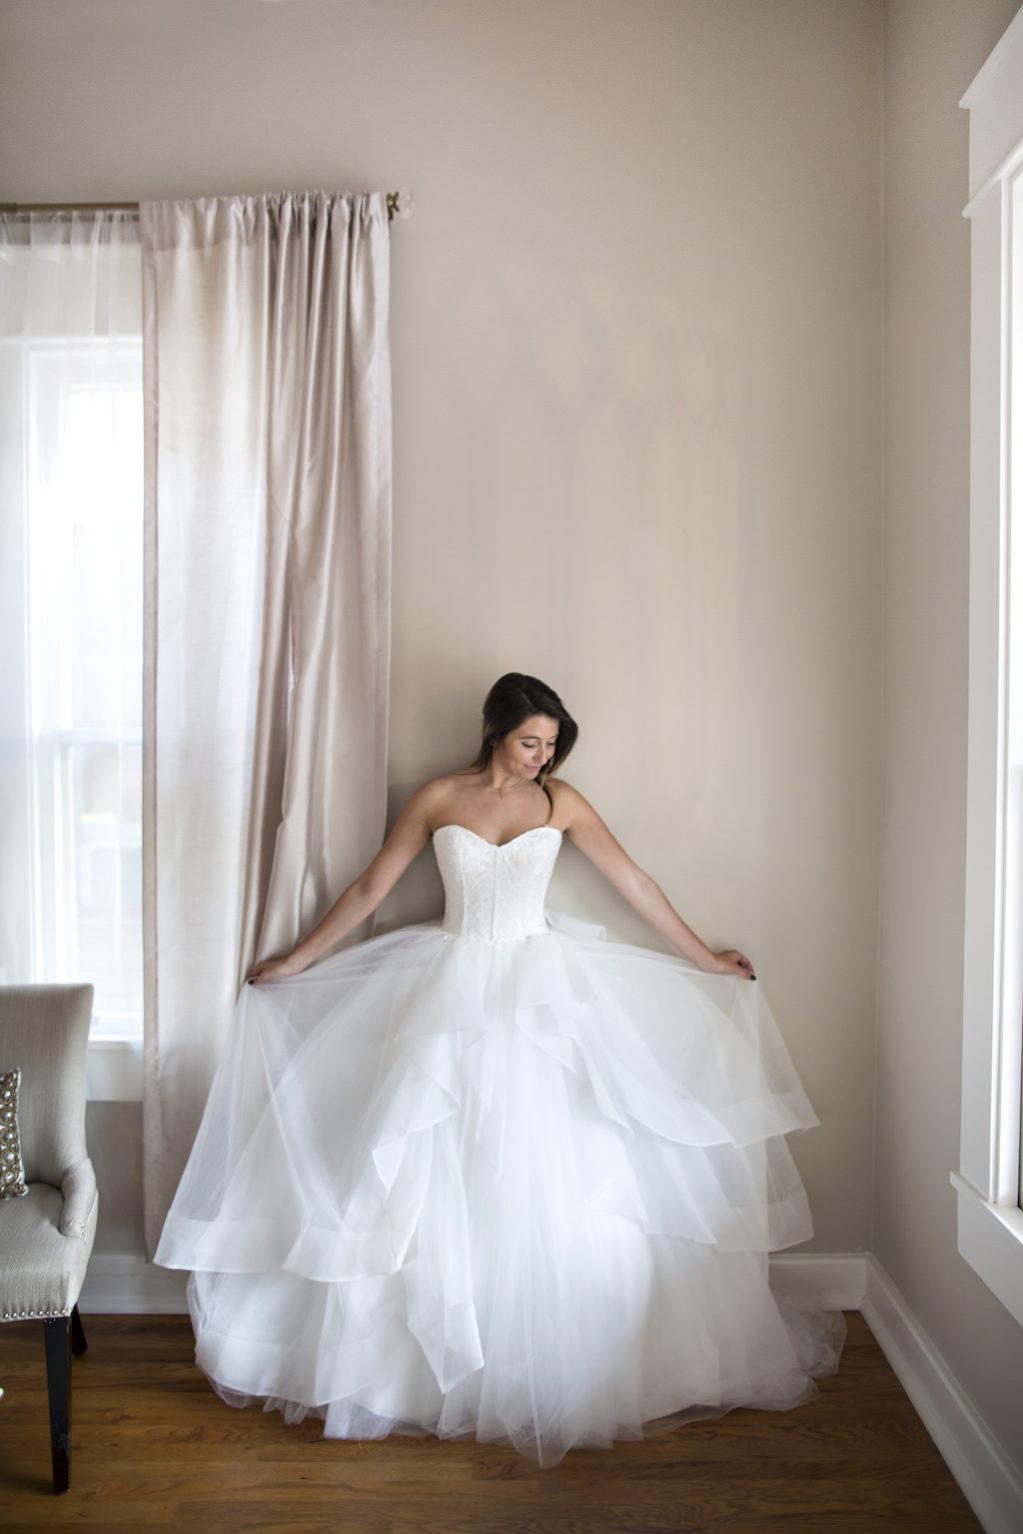 Lis Simon | The Bride Tampa Bridal Shop | Couture Wedding Dress Salon in Ybor City | Wedding & Fashion Photographer Djmael Photography